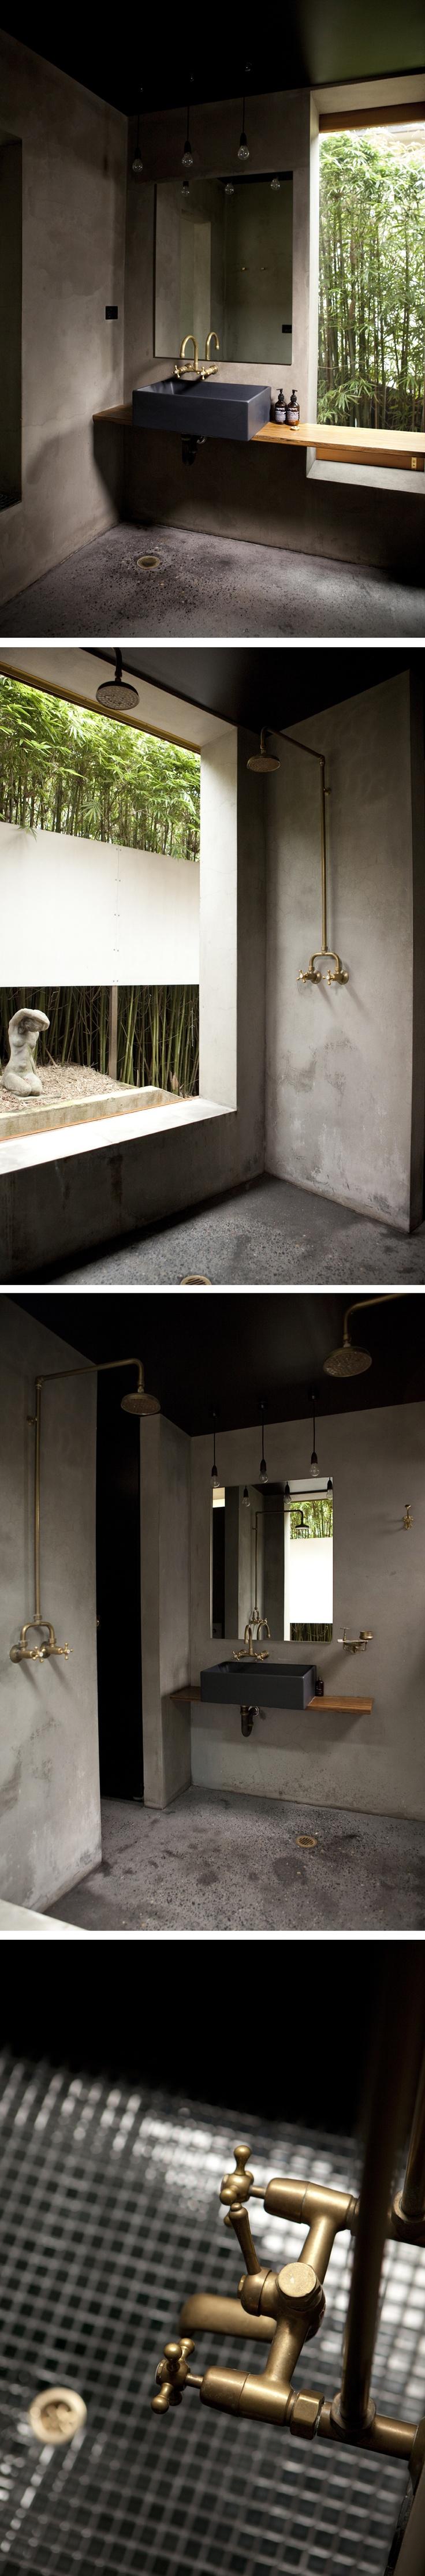 decoración-de-baño-Tarragona-9 (2)